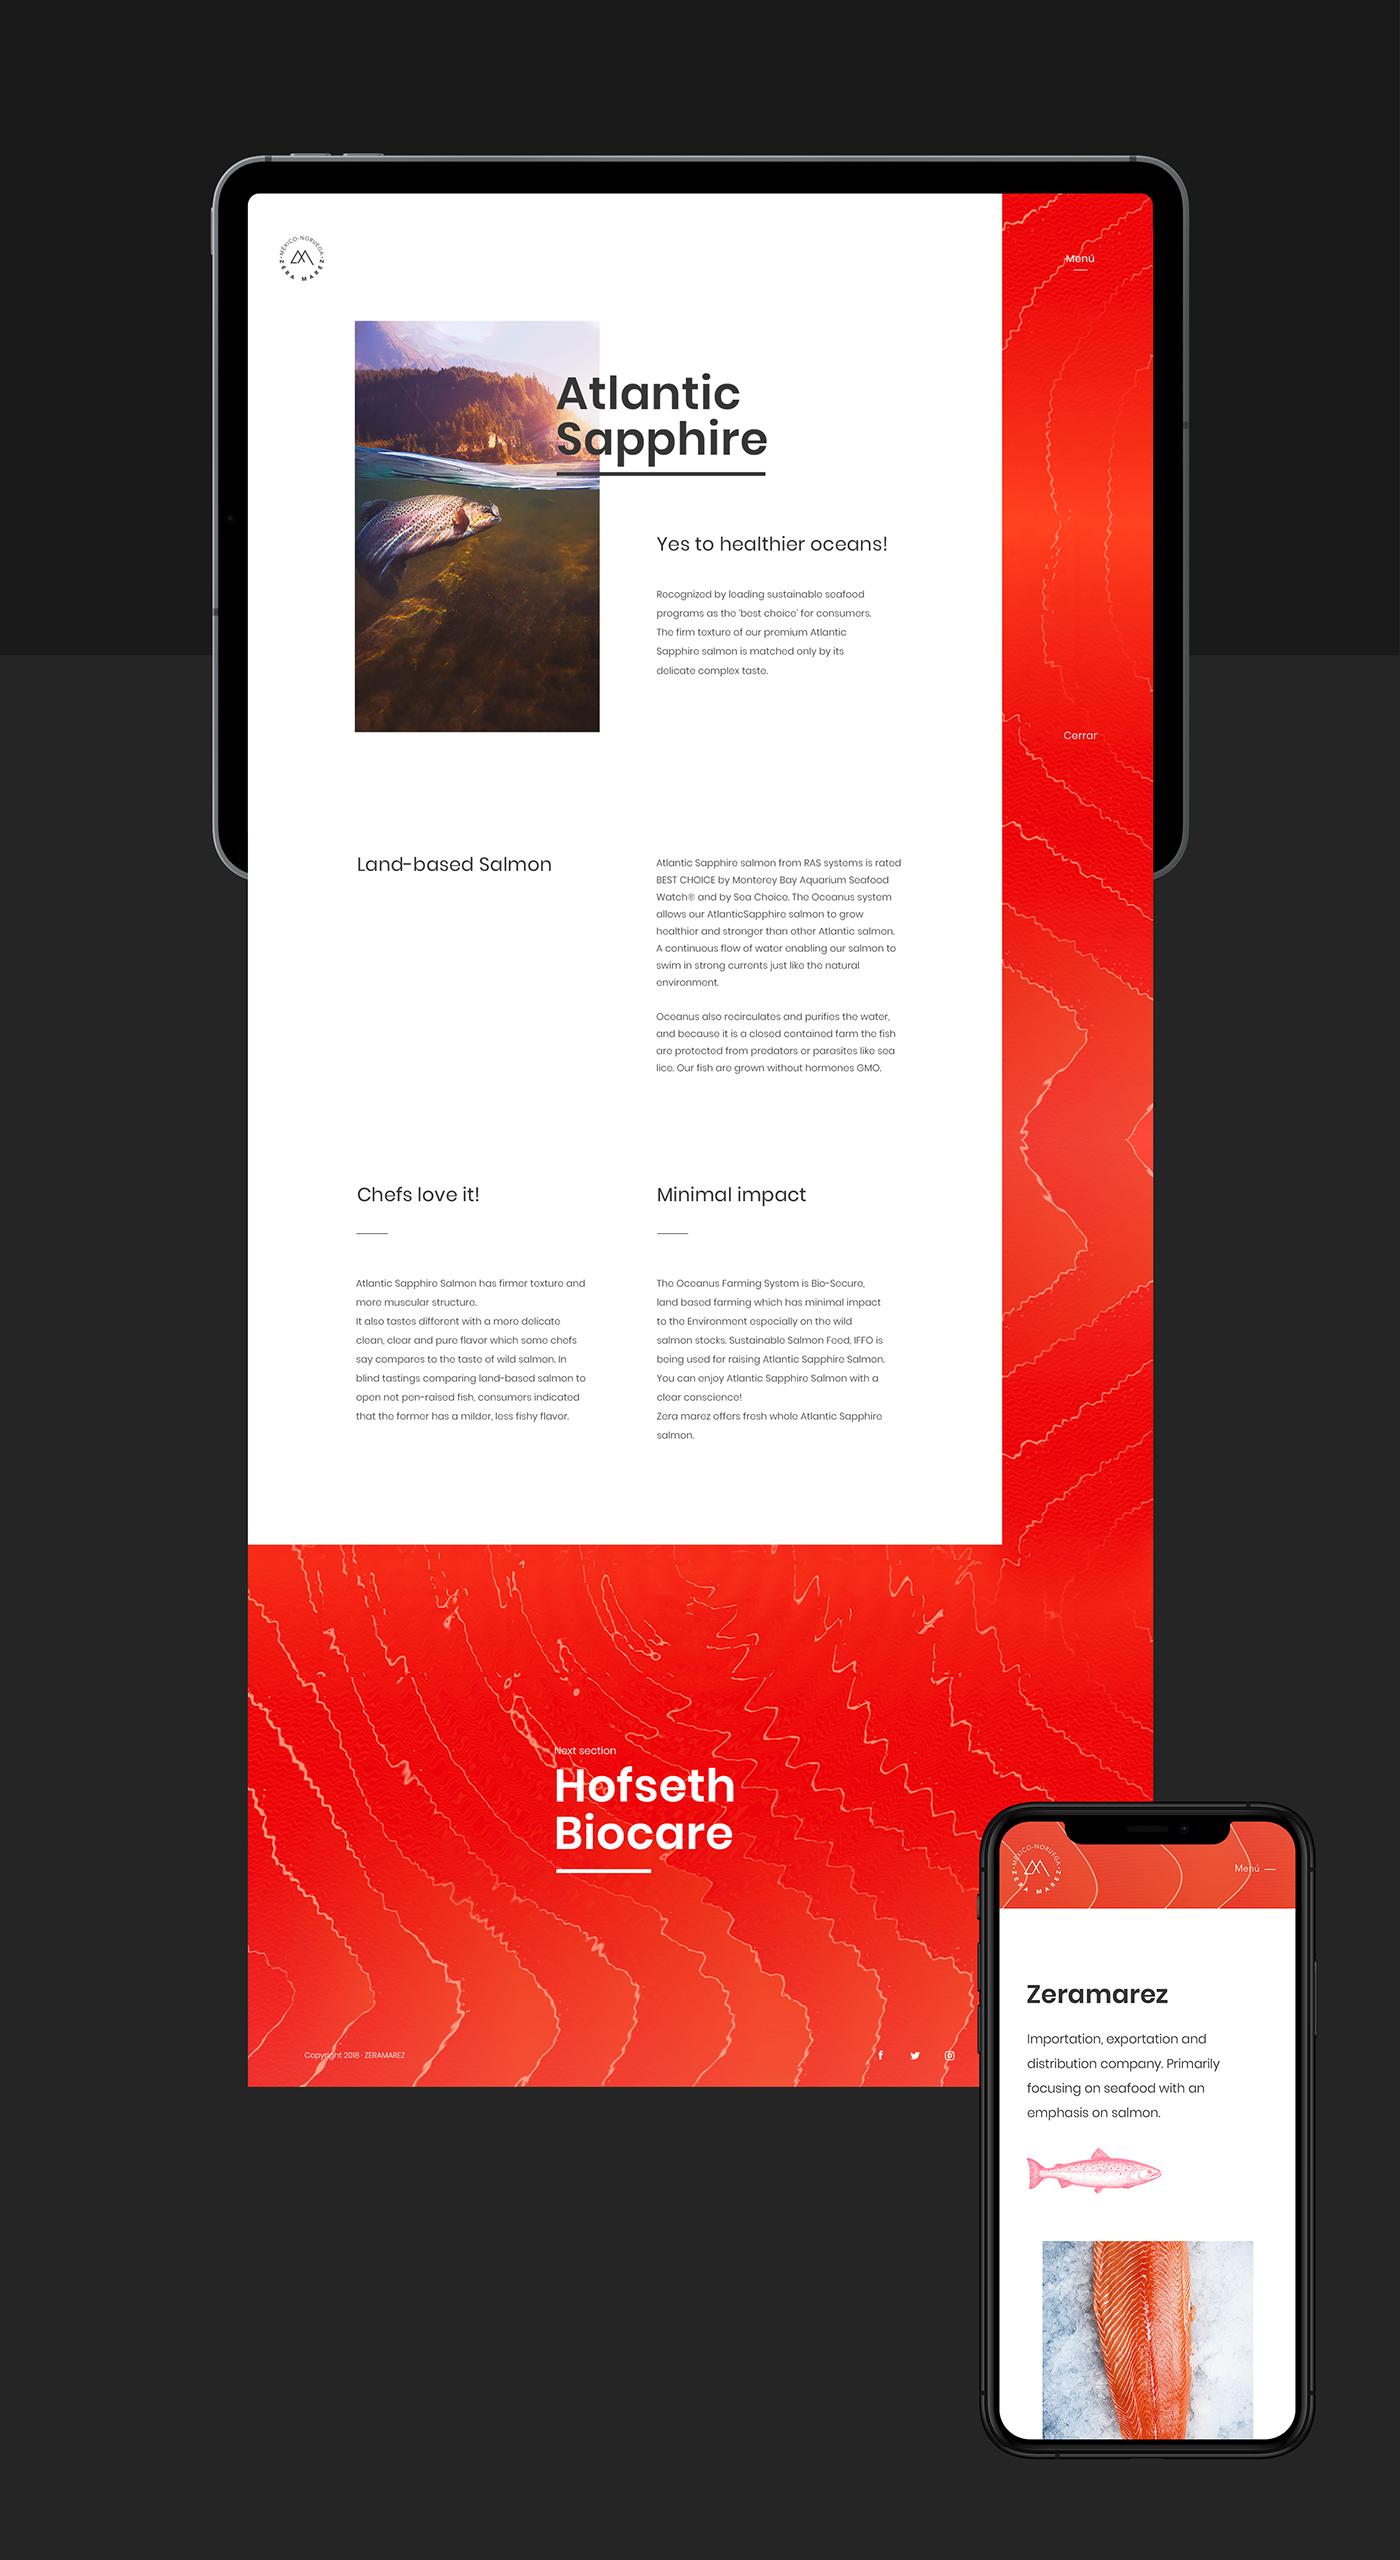 Zeramarez Webdesign On Behance Web Design Minimalist Web Design Email Design Inspiration